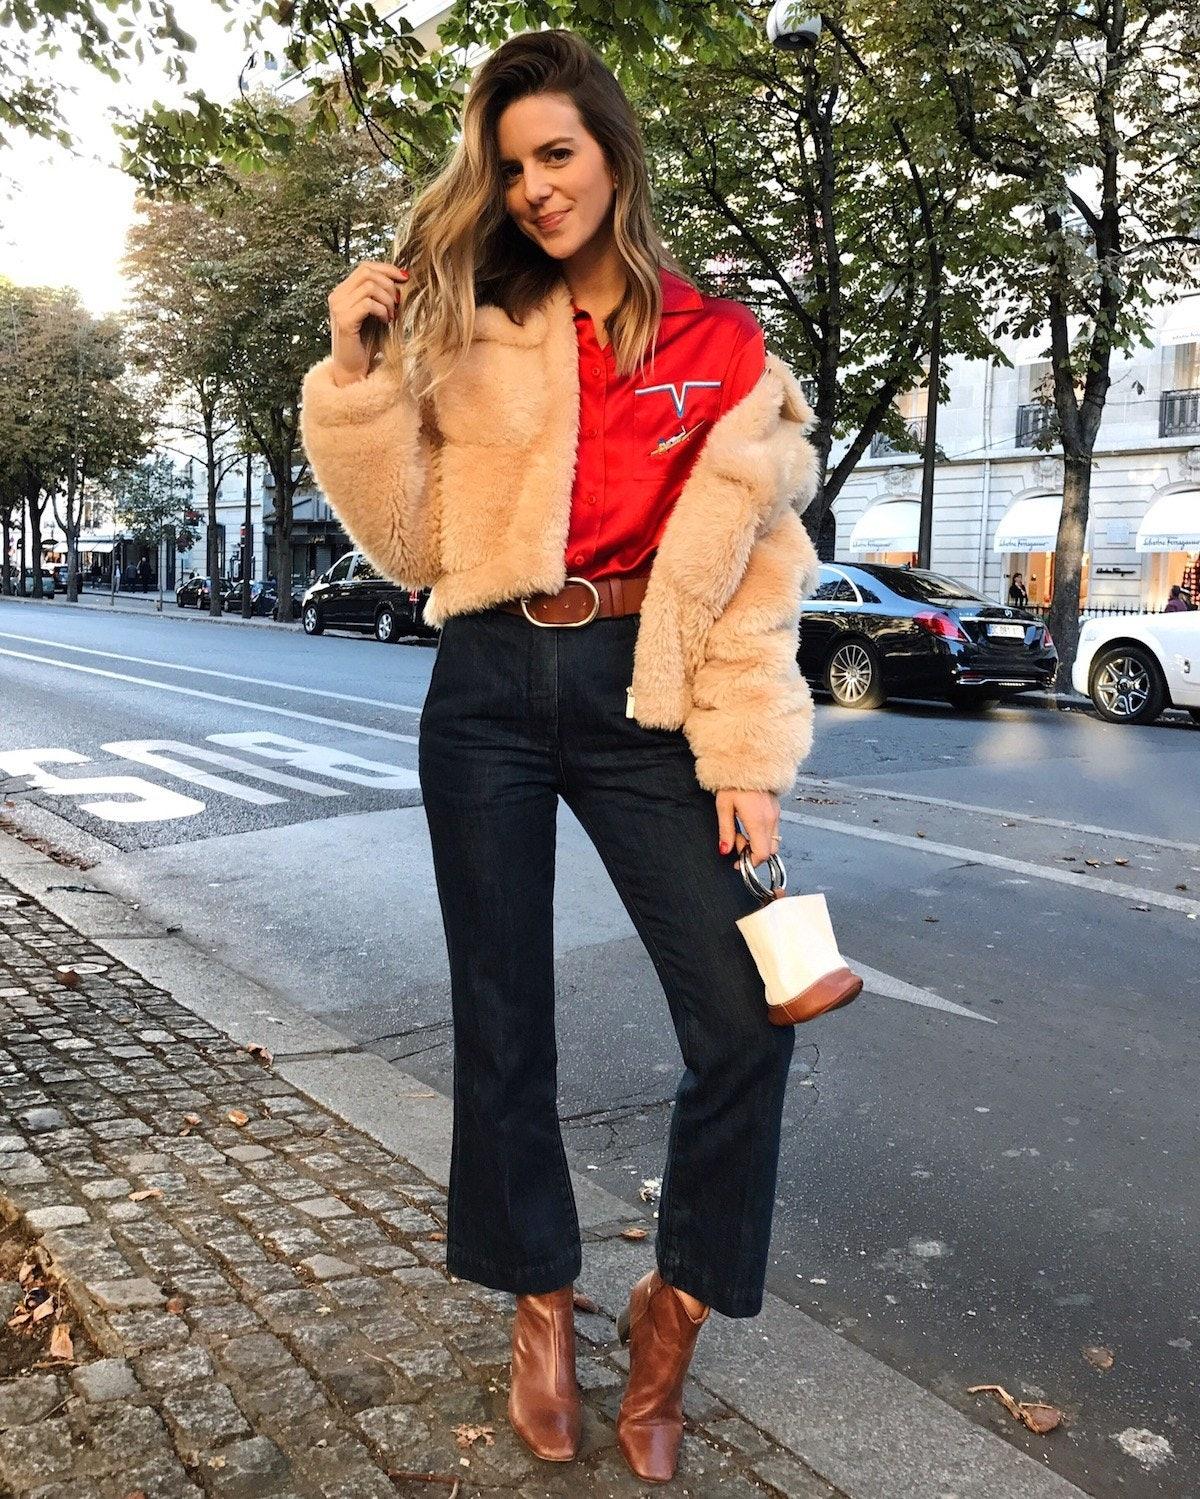 SLIDE 1 - paris-fashion-week-fur-coat copy 2.JPG